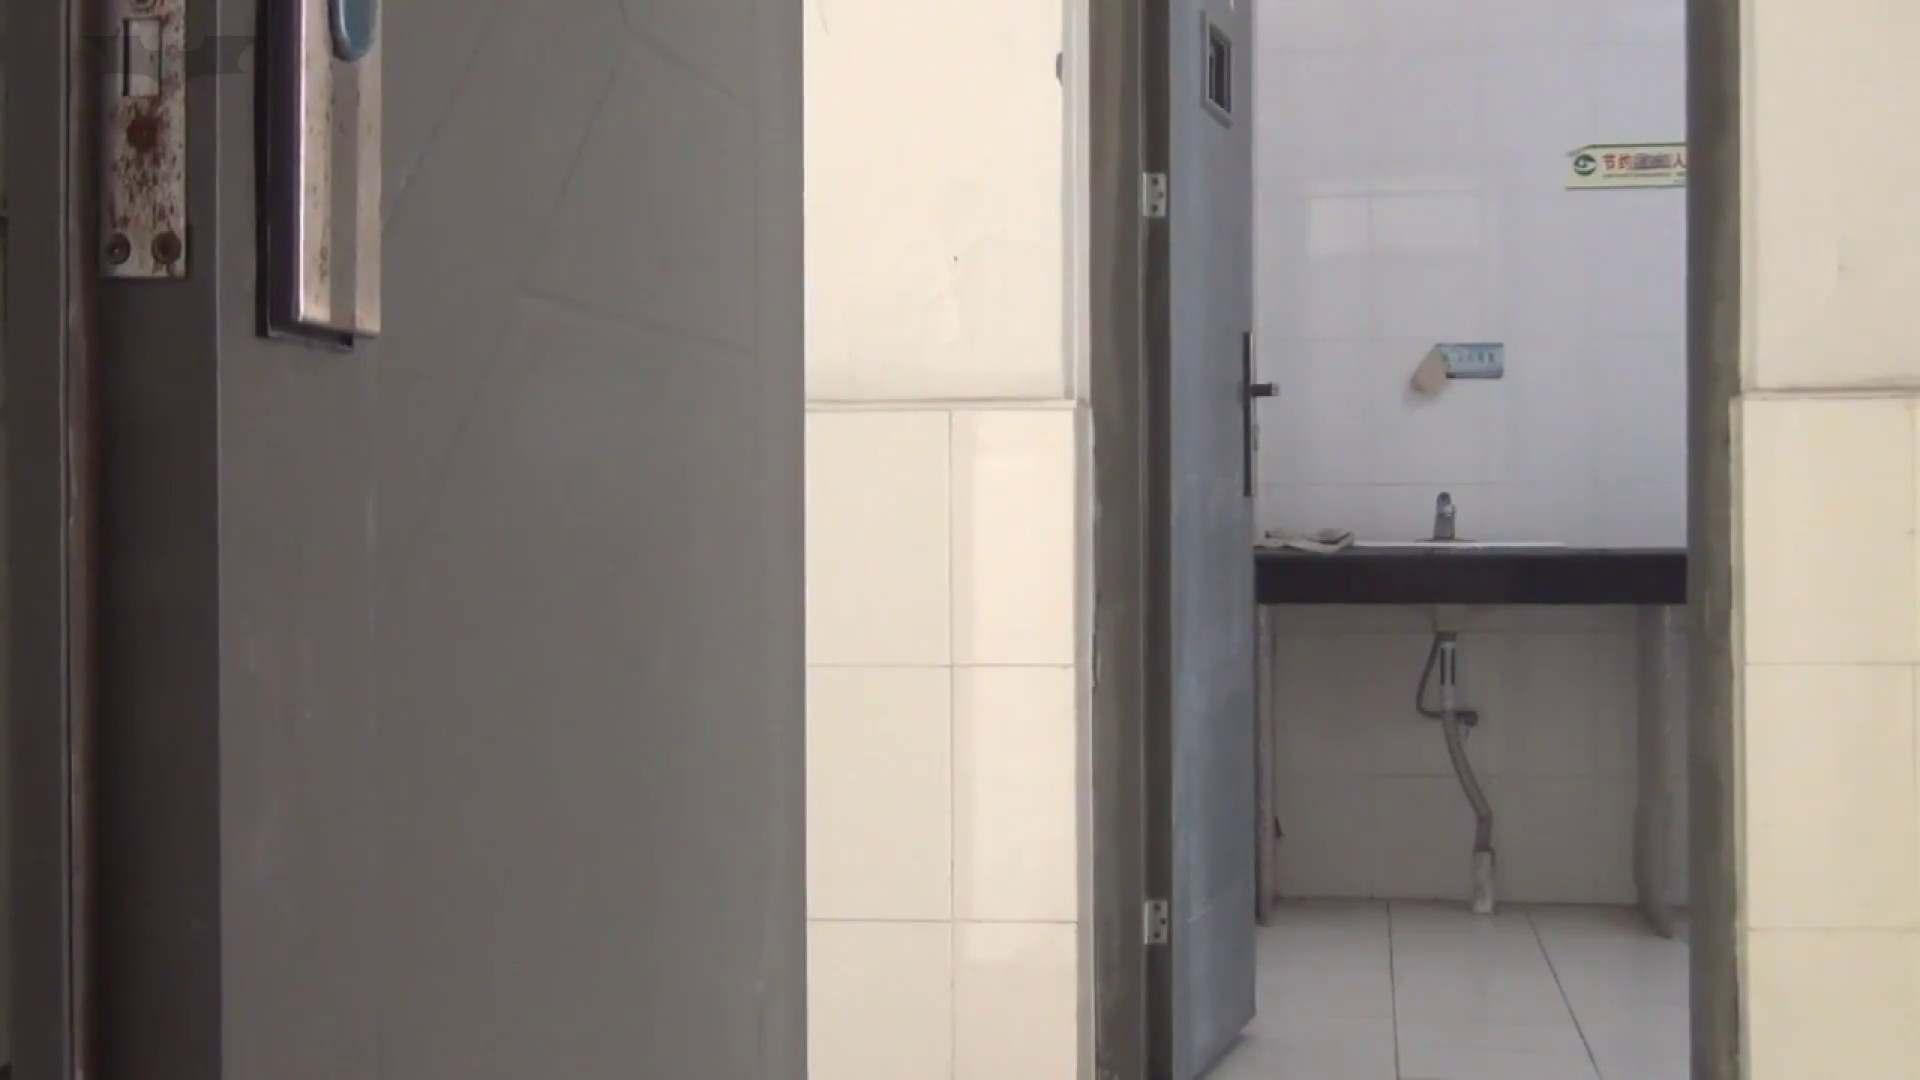 JD盗撮 美女の洗面所の秘密 Vol.15 ギャル攻め   盗撮で悶絶  72画像 41